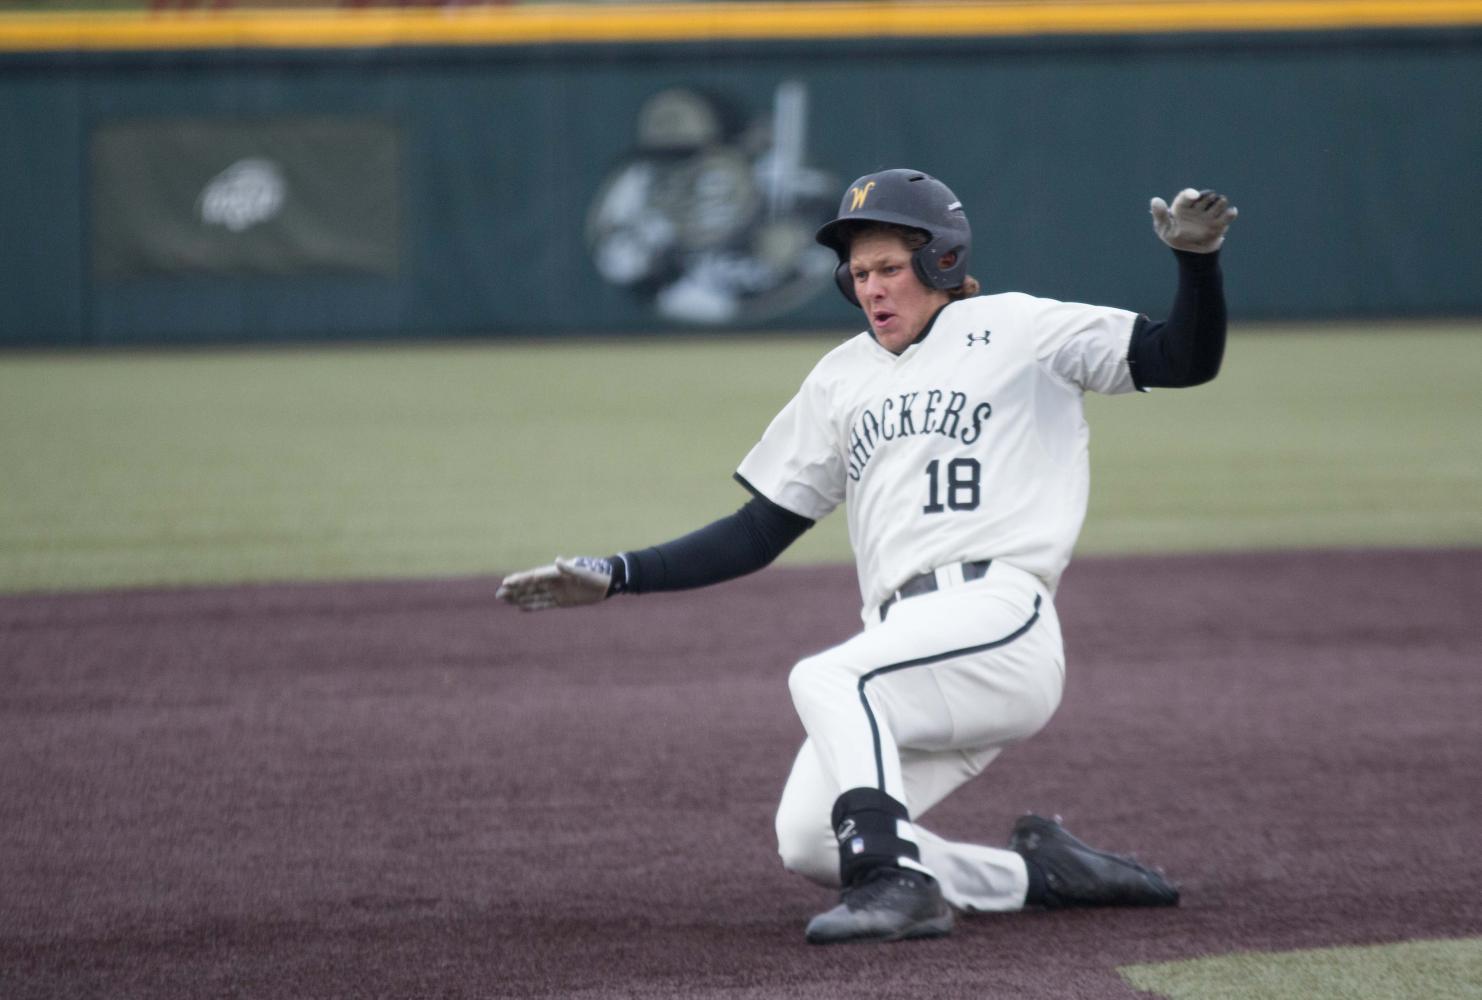 Wichita State third baseman Alec Bohm slides to third base during the game against Illinois State at Eck Stadium (April 29, 2017)